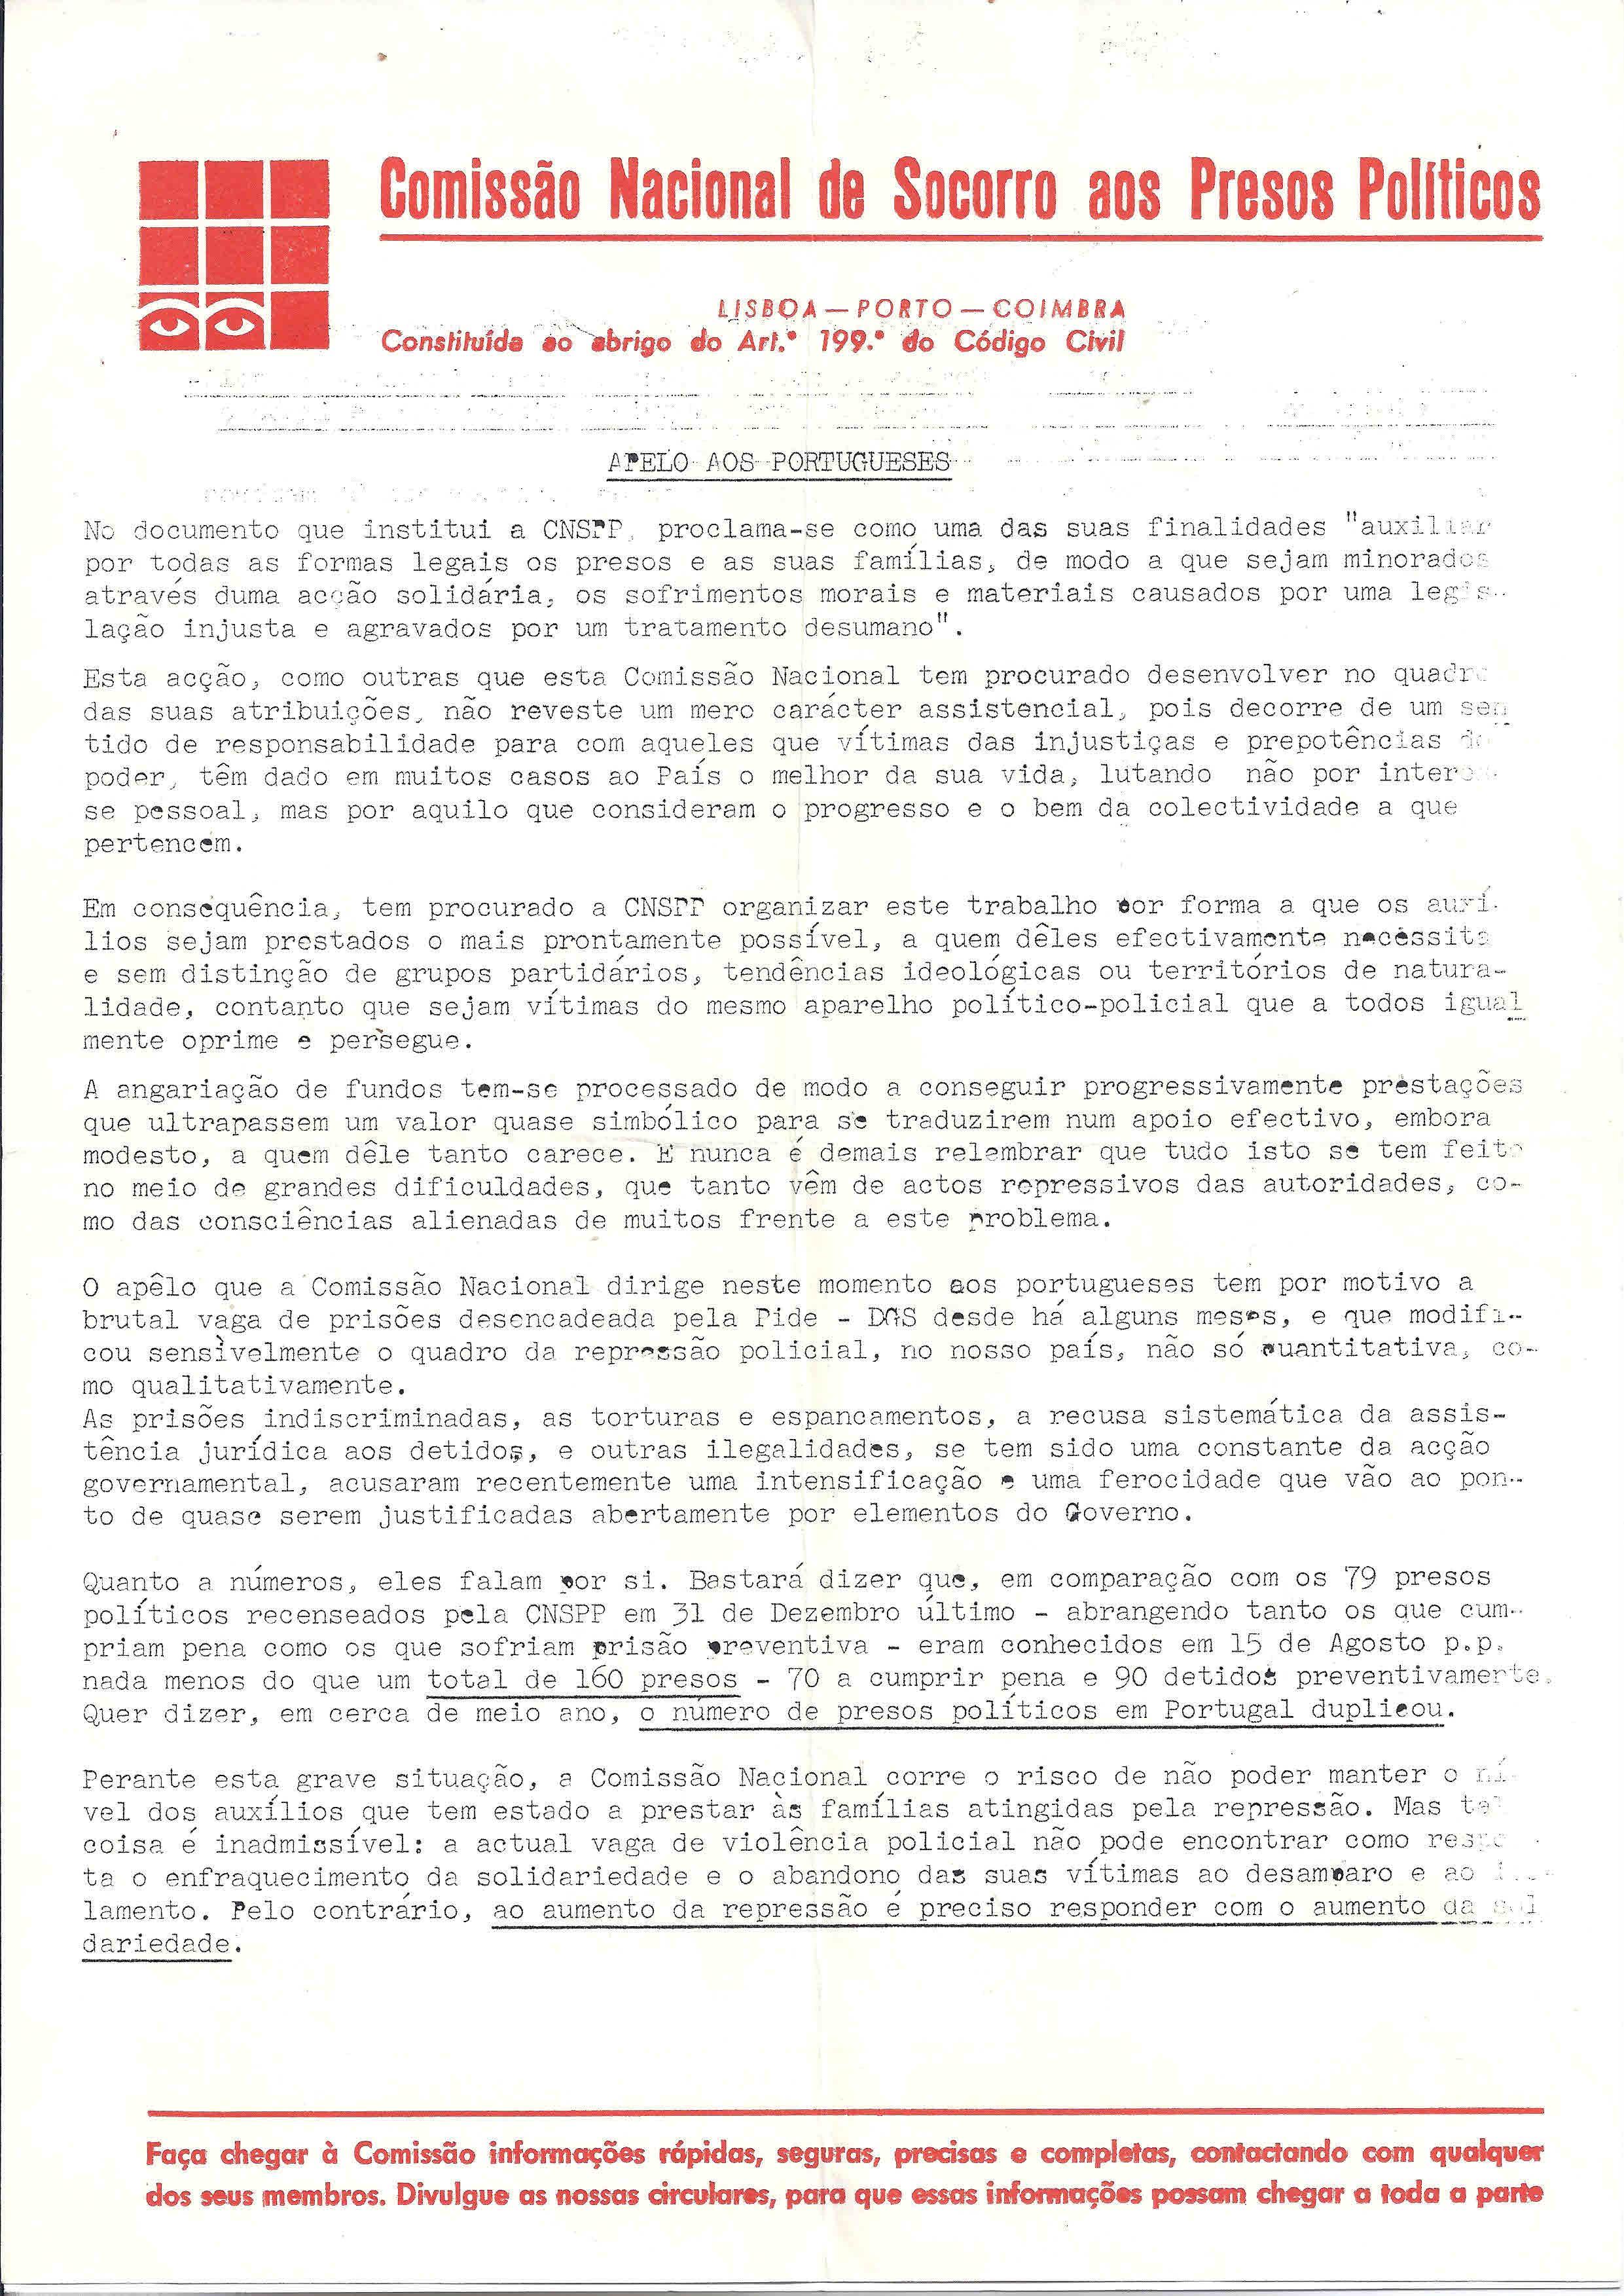 Comisso nacional de socorro aos presos polticos ephemera comisso nacional de socorro aos presos polticos ephemera biblioteca e arquivo de jos pacheco pereira fandeluxe Gallery